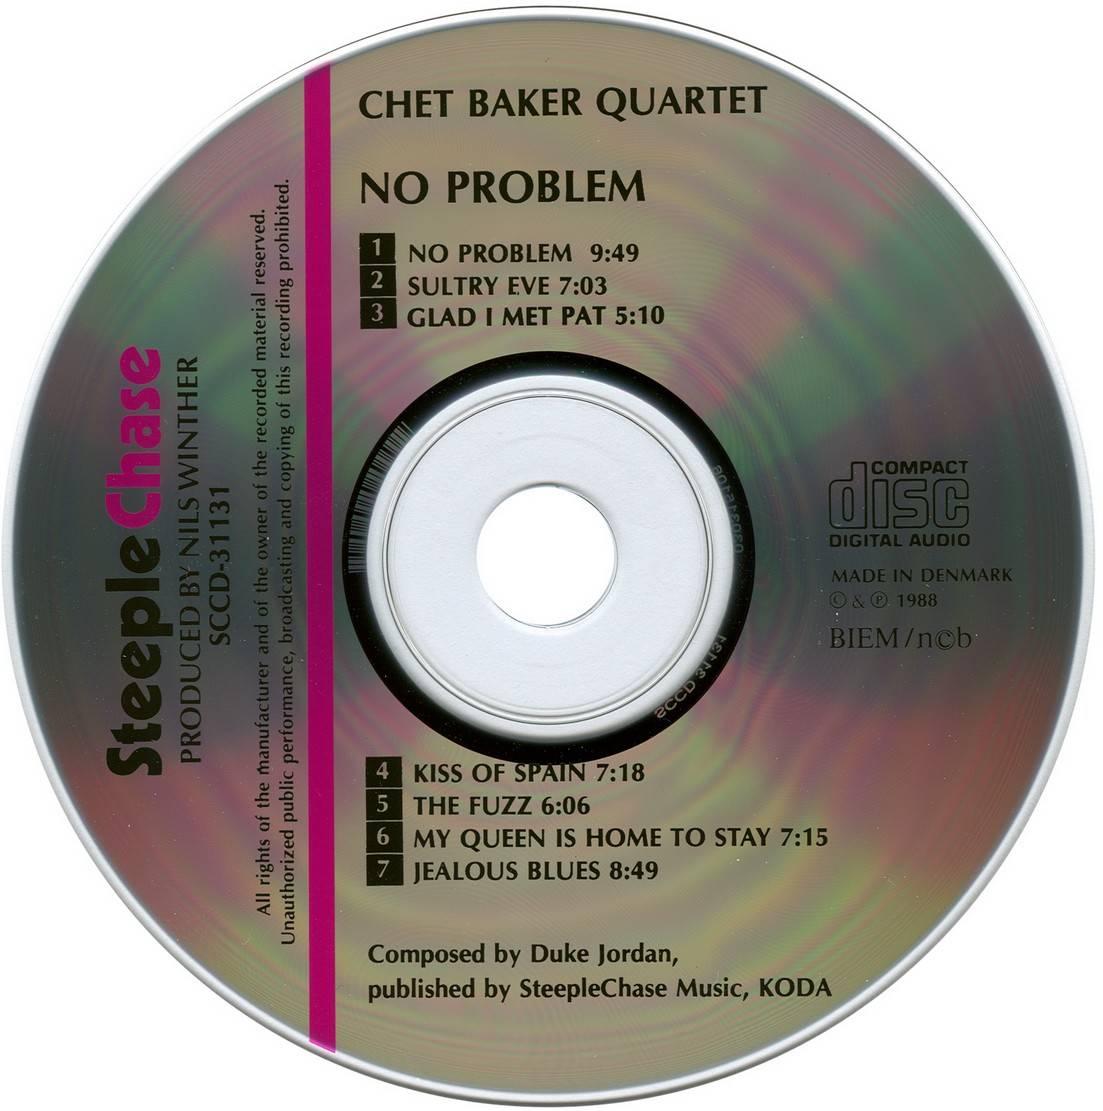 Chet Baker Quartet No Problem 1979 Steeplechase